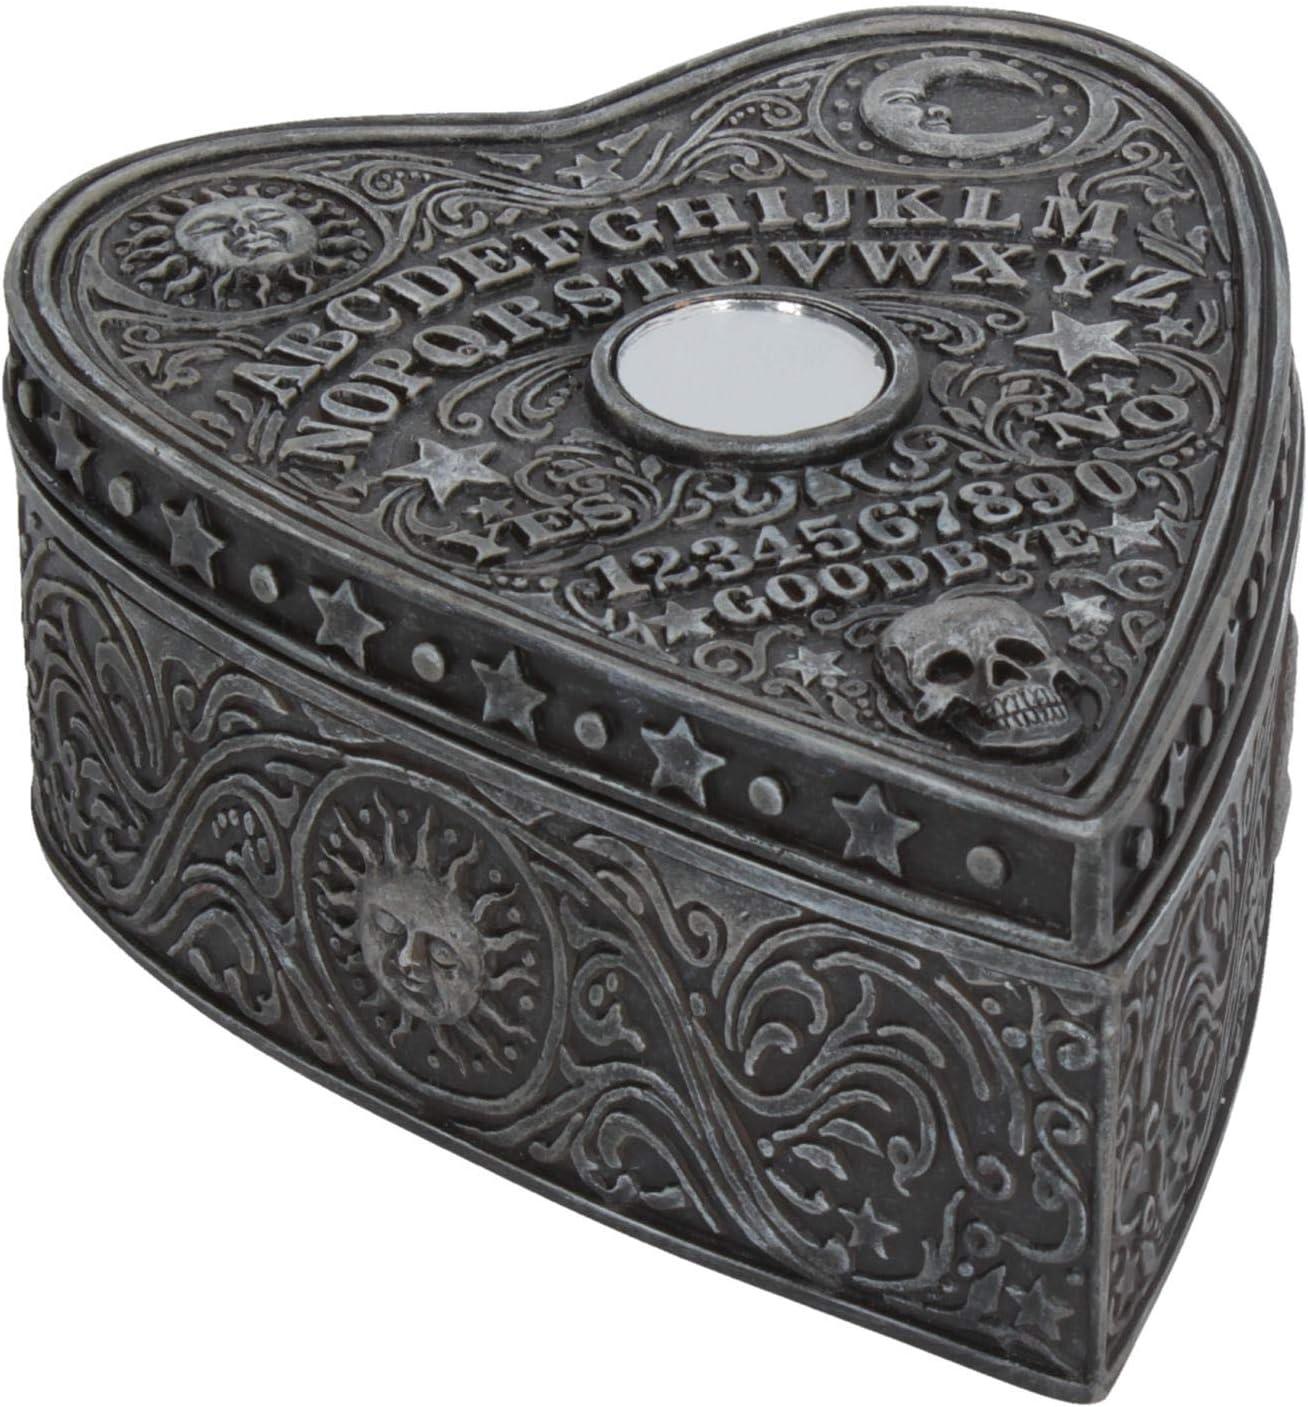 Nemesis Now Spirit Board Box 9cm Black